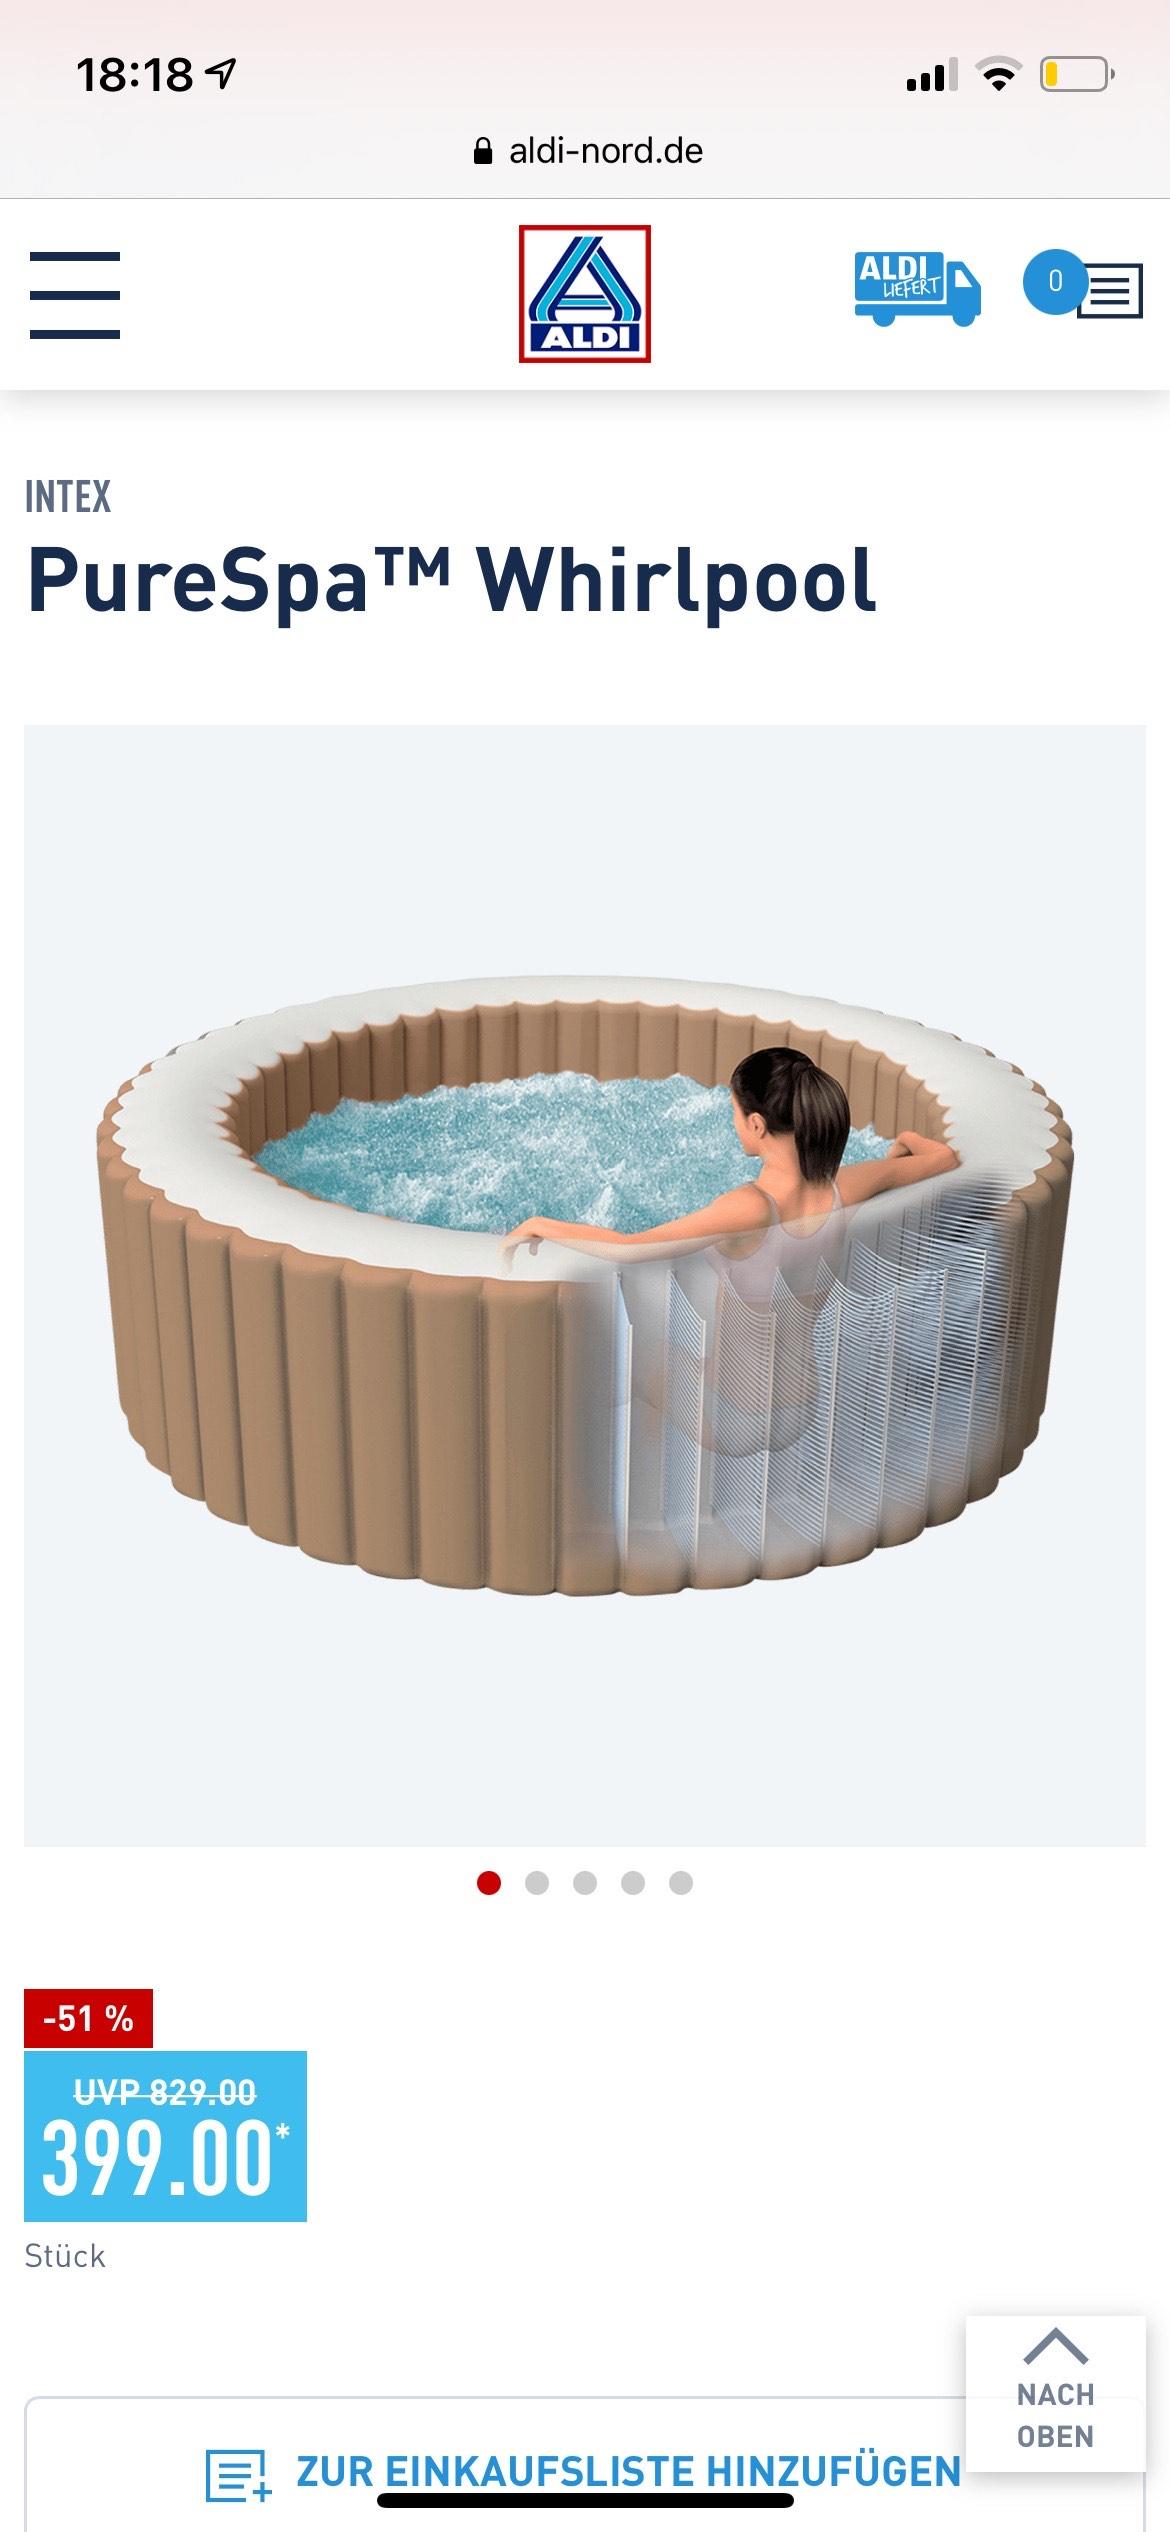 Intex PureSpa Whirlpool ab 12.05 bei Aldi Nord